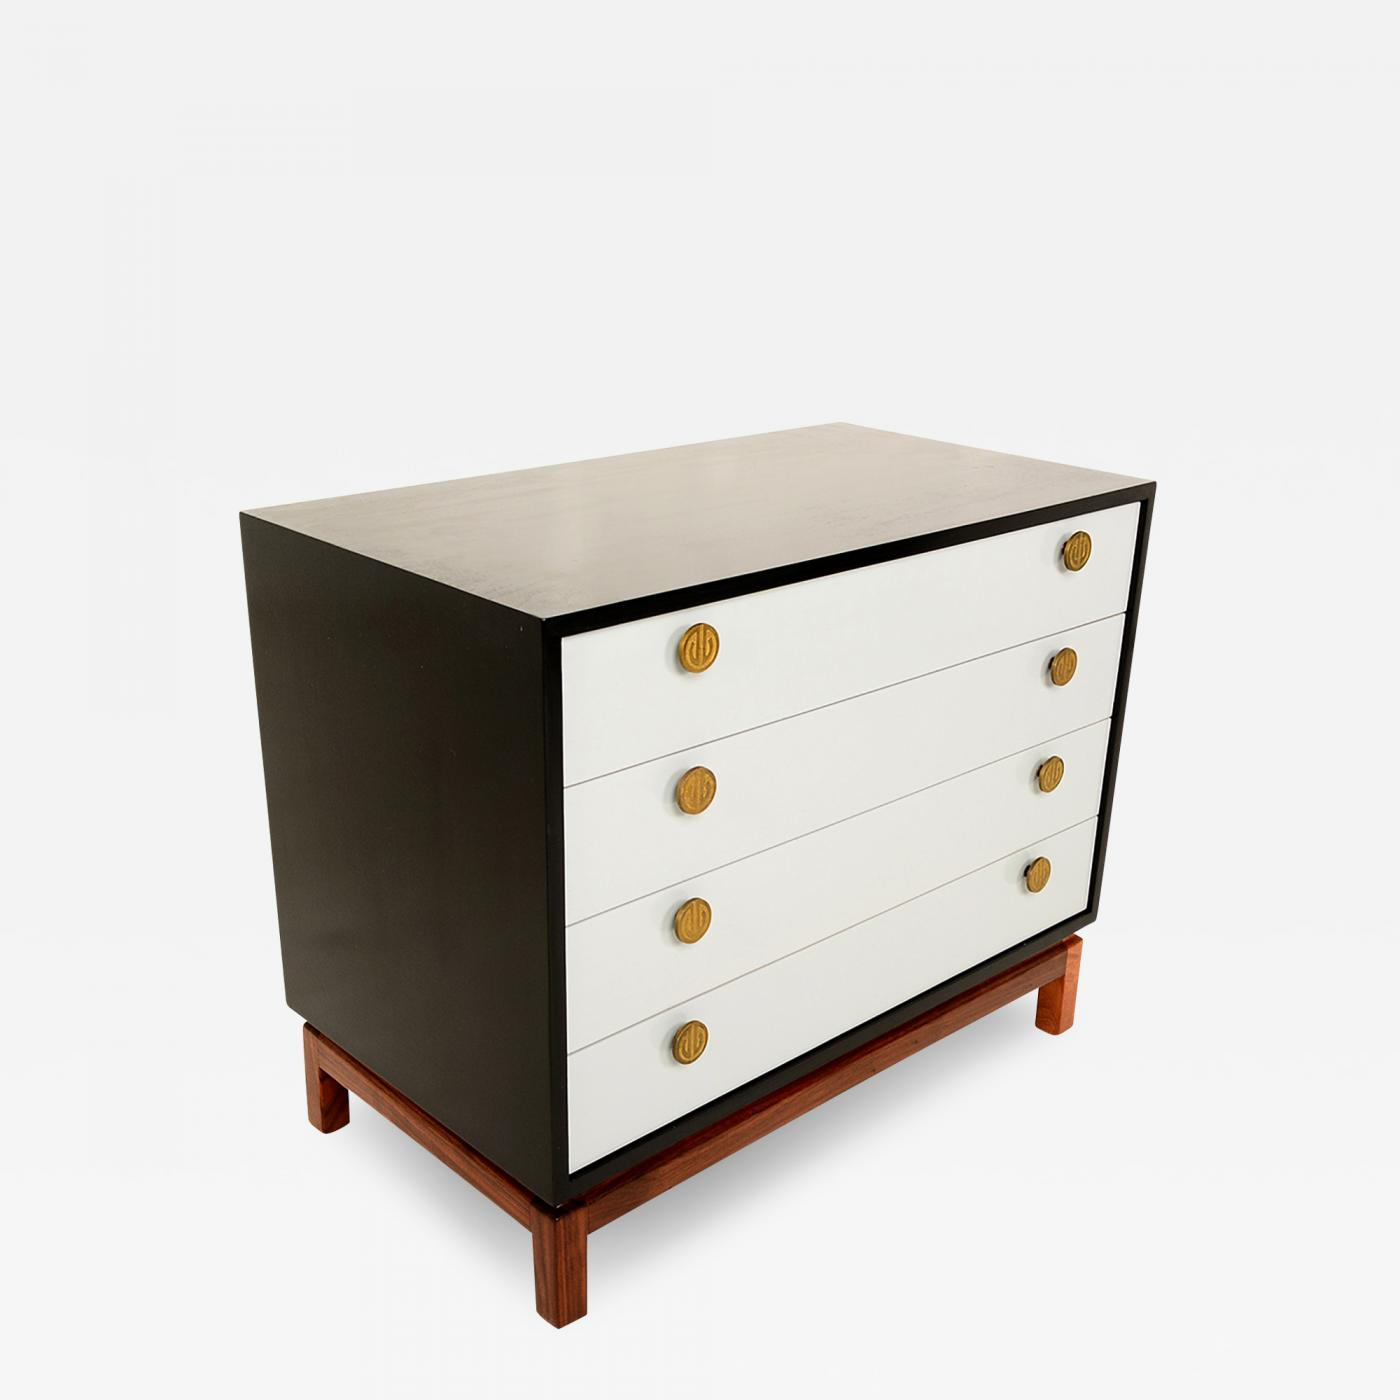 Image of: Cal Mode Mid Century Modern Cal Mode Dresser Walnut Wood With Brass Pulls